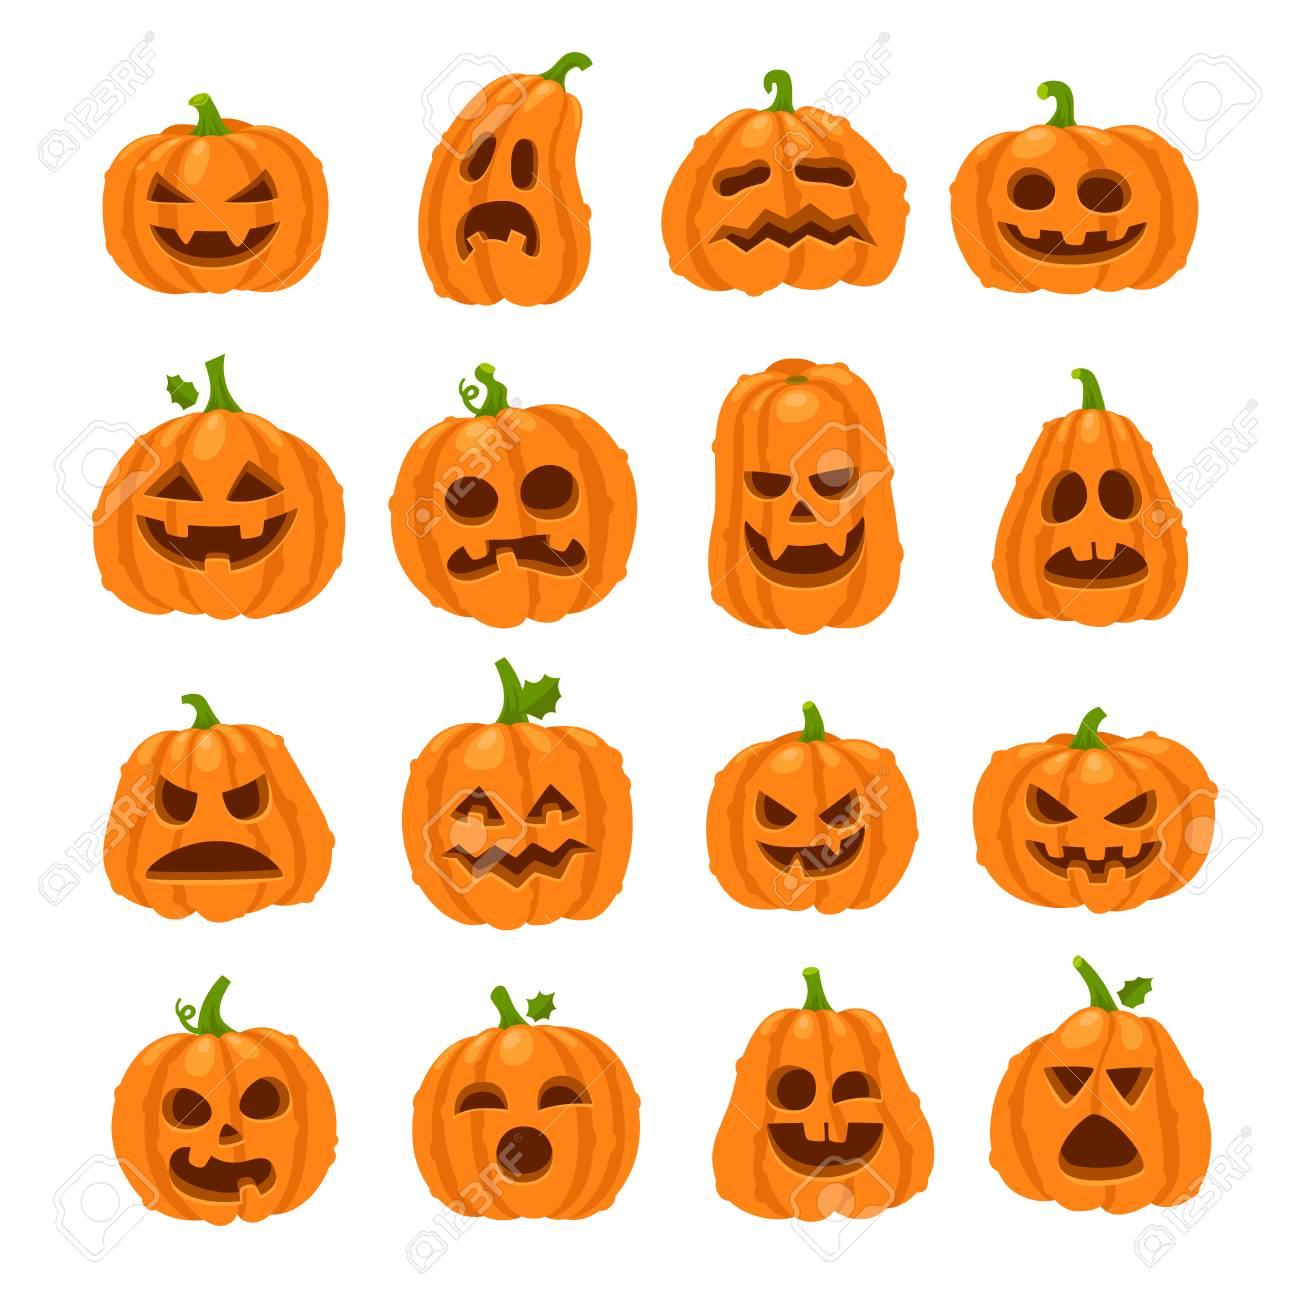 Halloween Pumpkin Cartoon Images.Cartoon Halloween Pumpkin Orange Pumpkins With Carving Scary